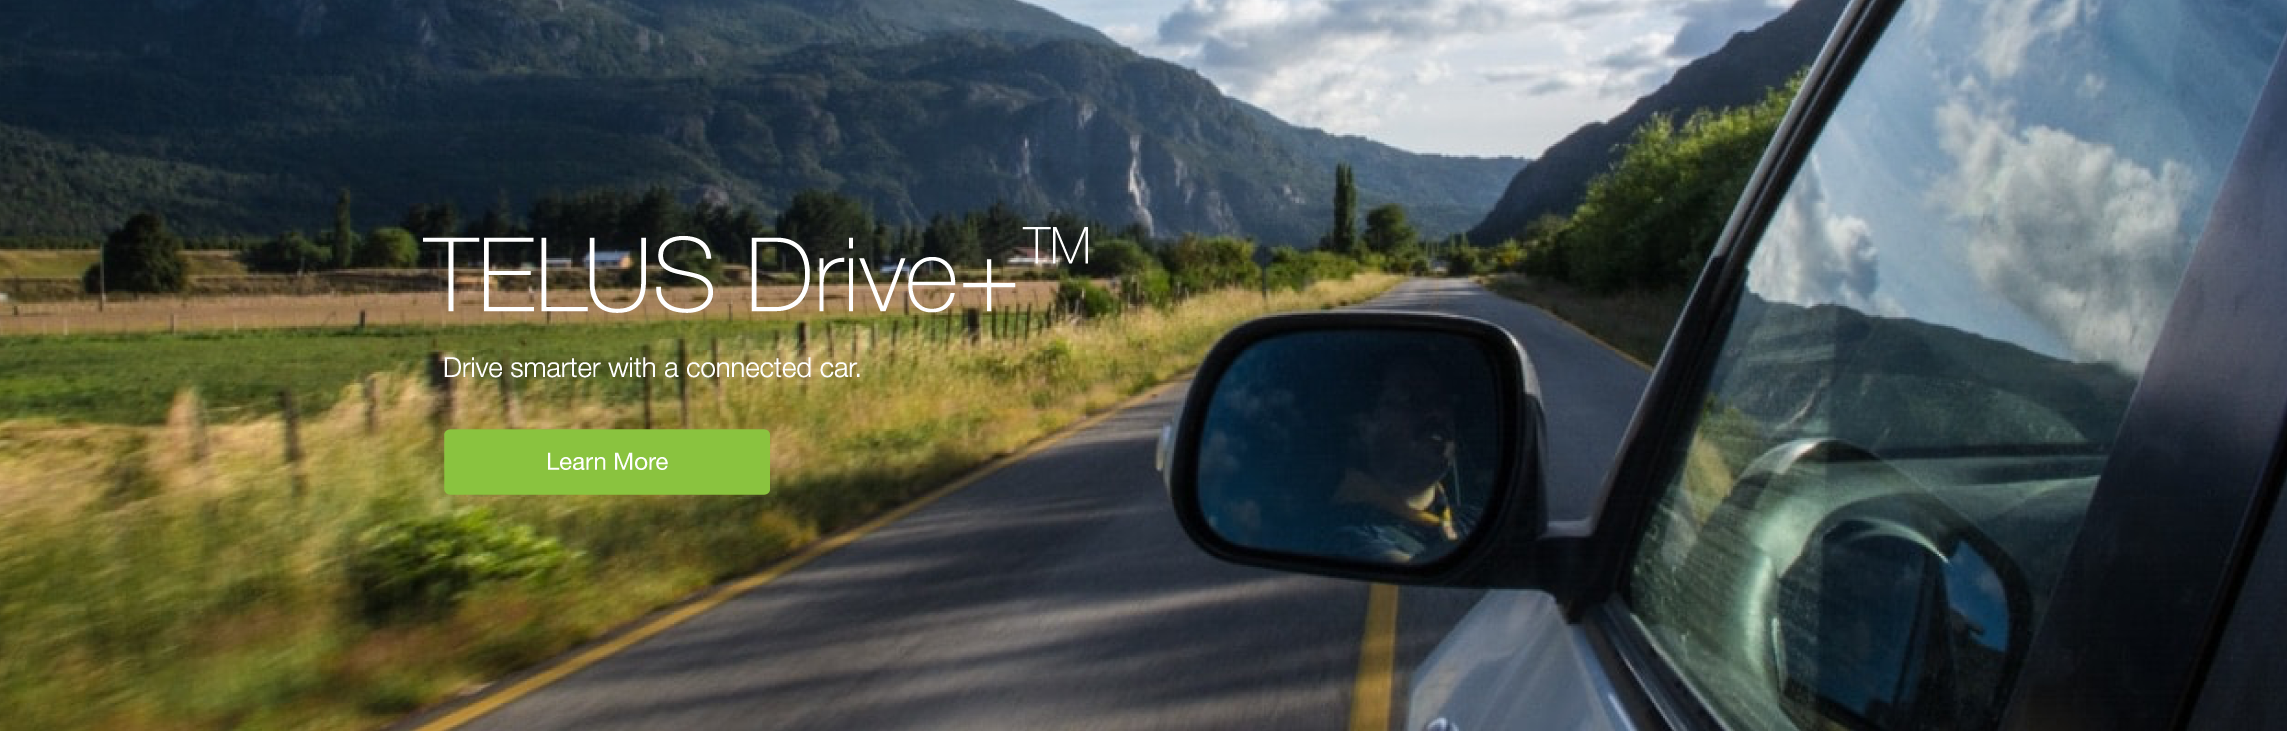 TELUS Drive +